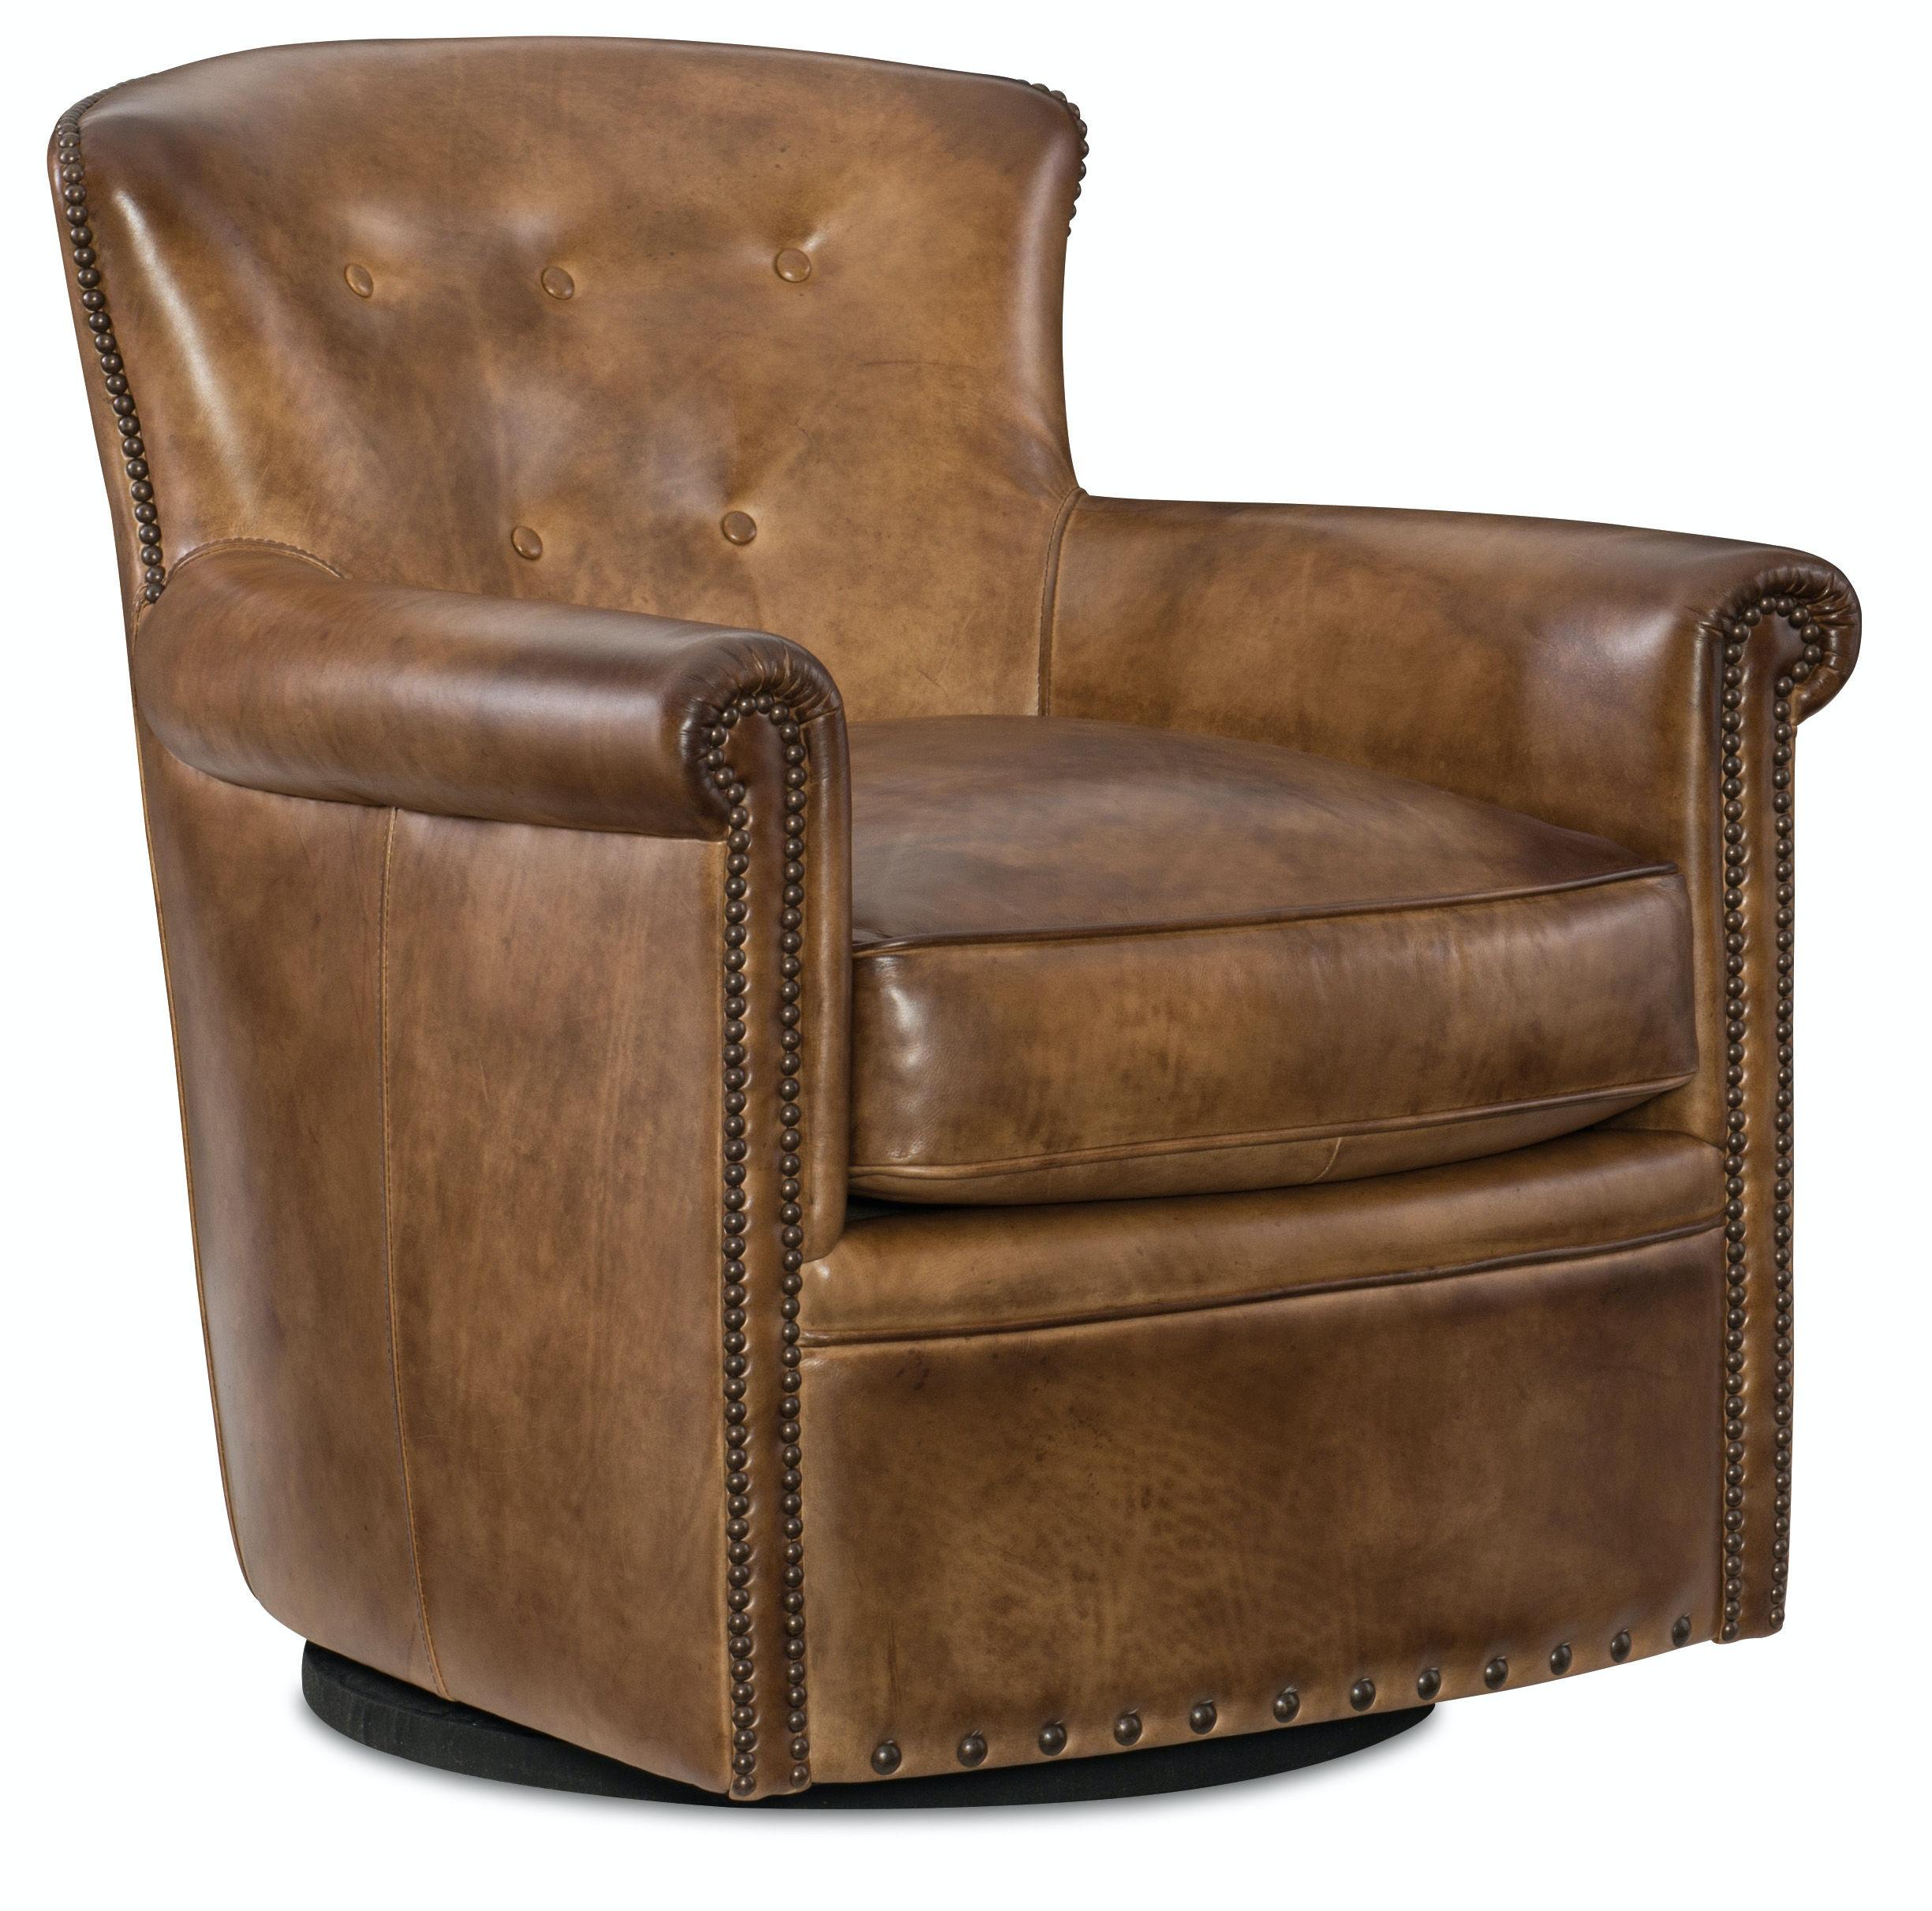 Hooker Furniture Jacob Swivel Club Chair CC510 SW 083